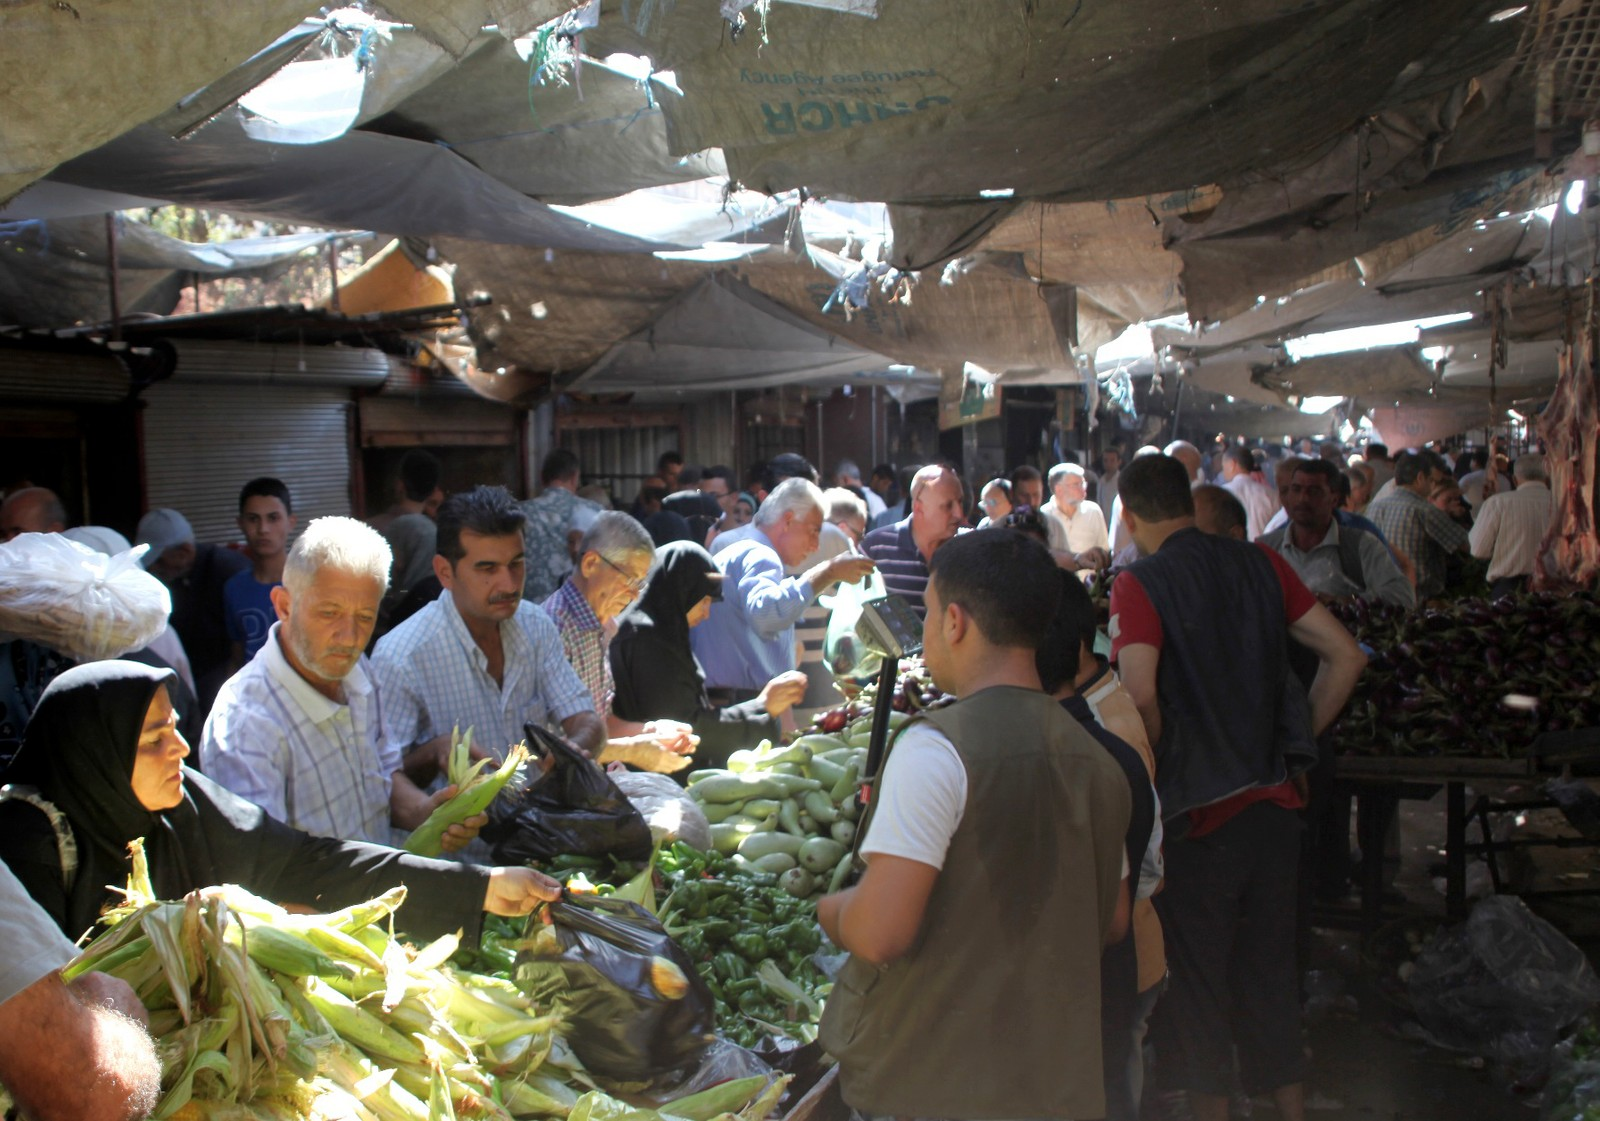 Handelen går som normalt på marknadsplassane i dei vestlege bydelane i Aleppo.